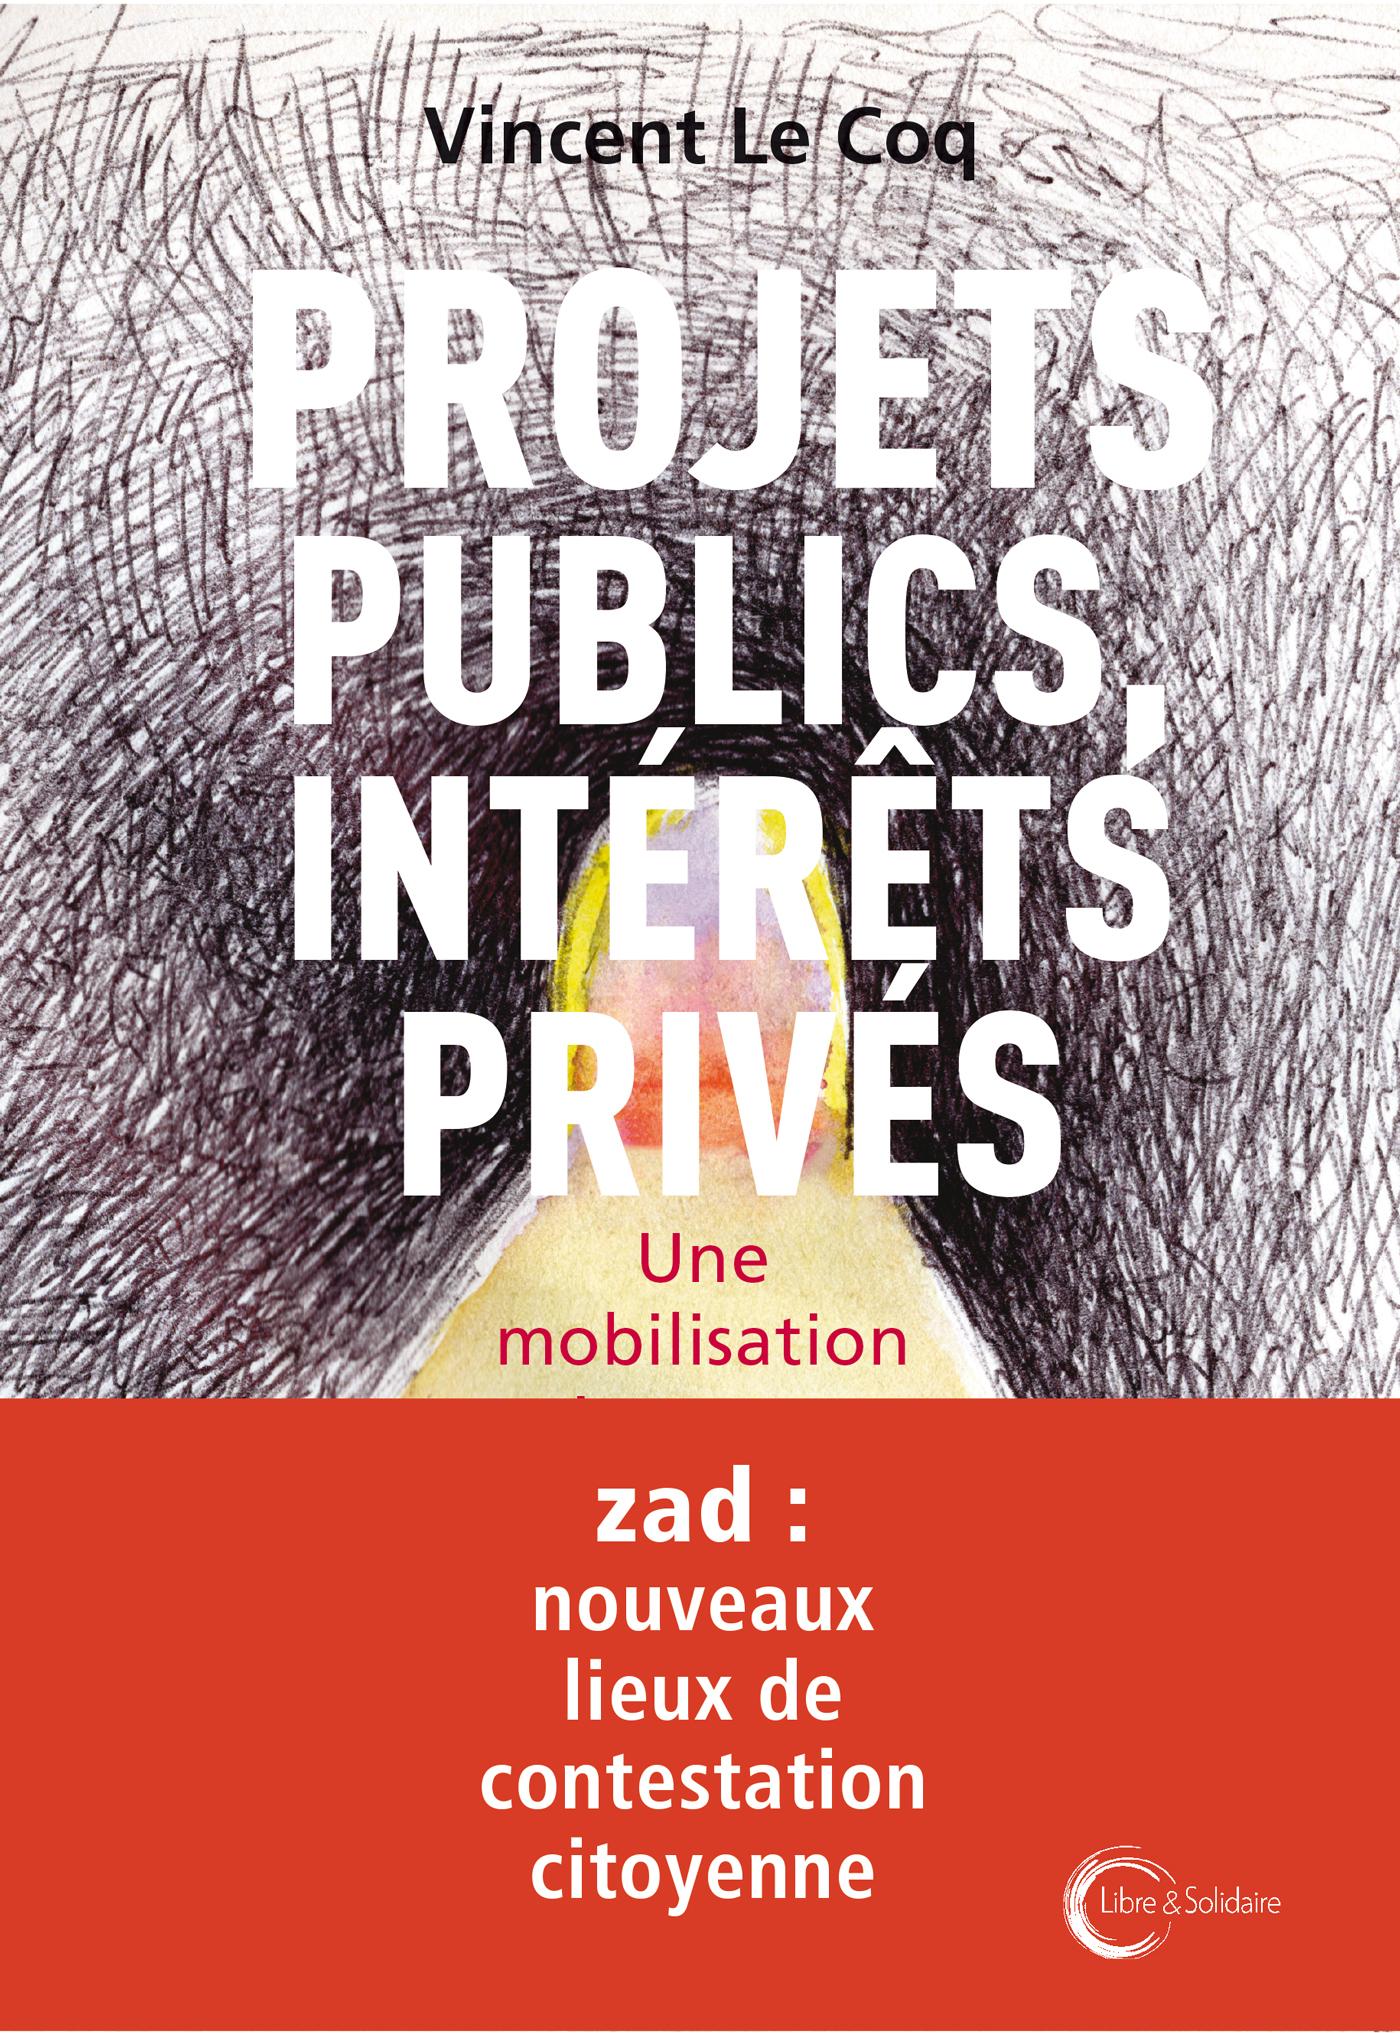 PROJETS PUBLICS, INTERETS PRIVES